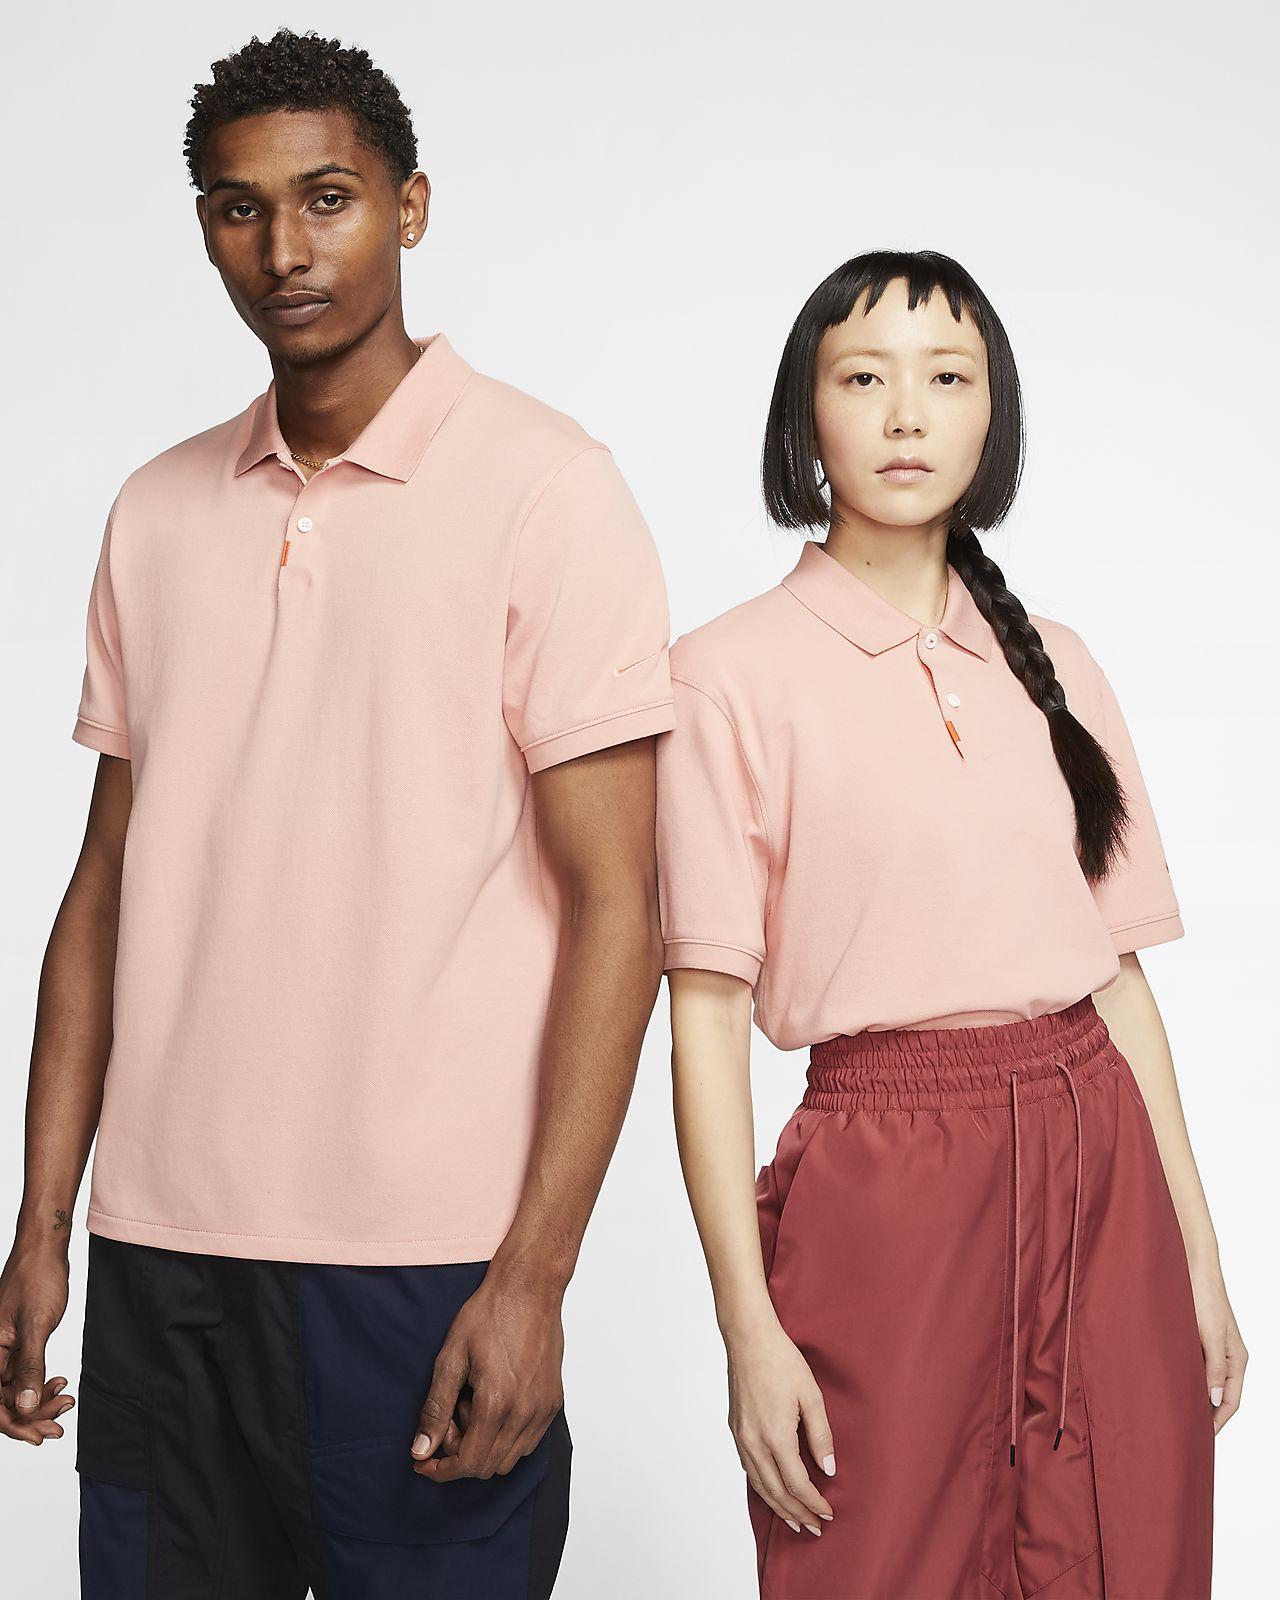 Unisex μπλούζα πόλο με στενή εφαρμογή The Nike Polo